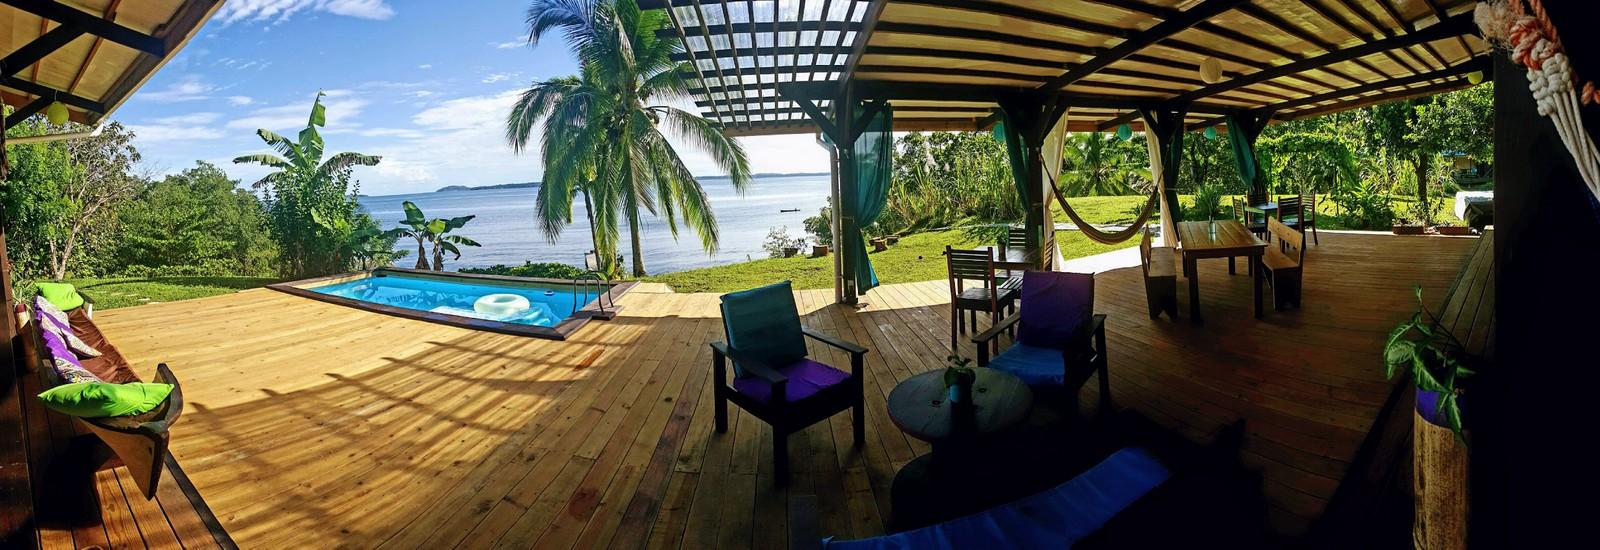 terrasse - el caribeo